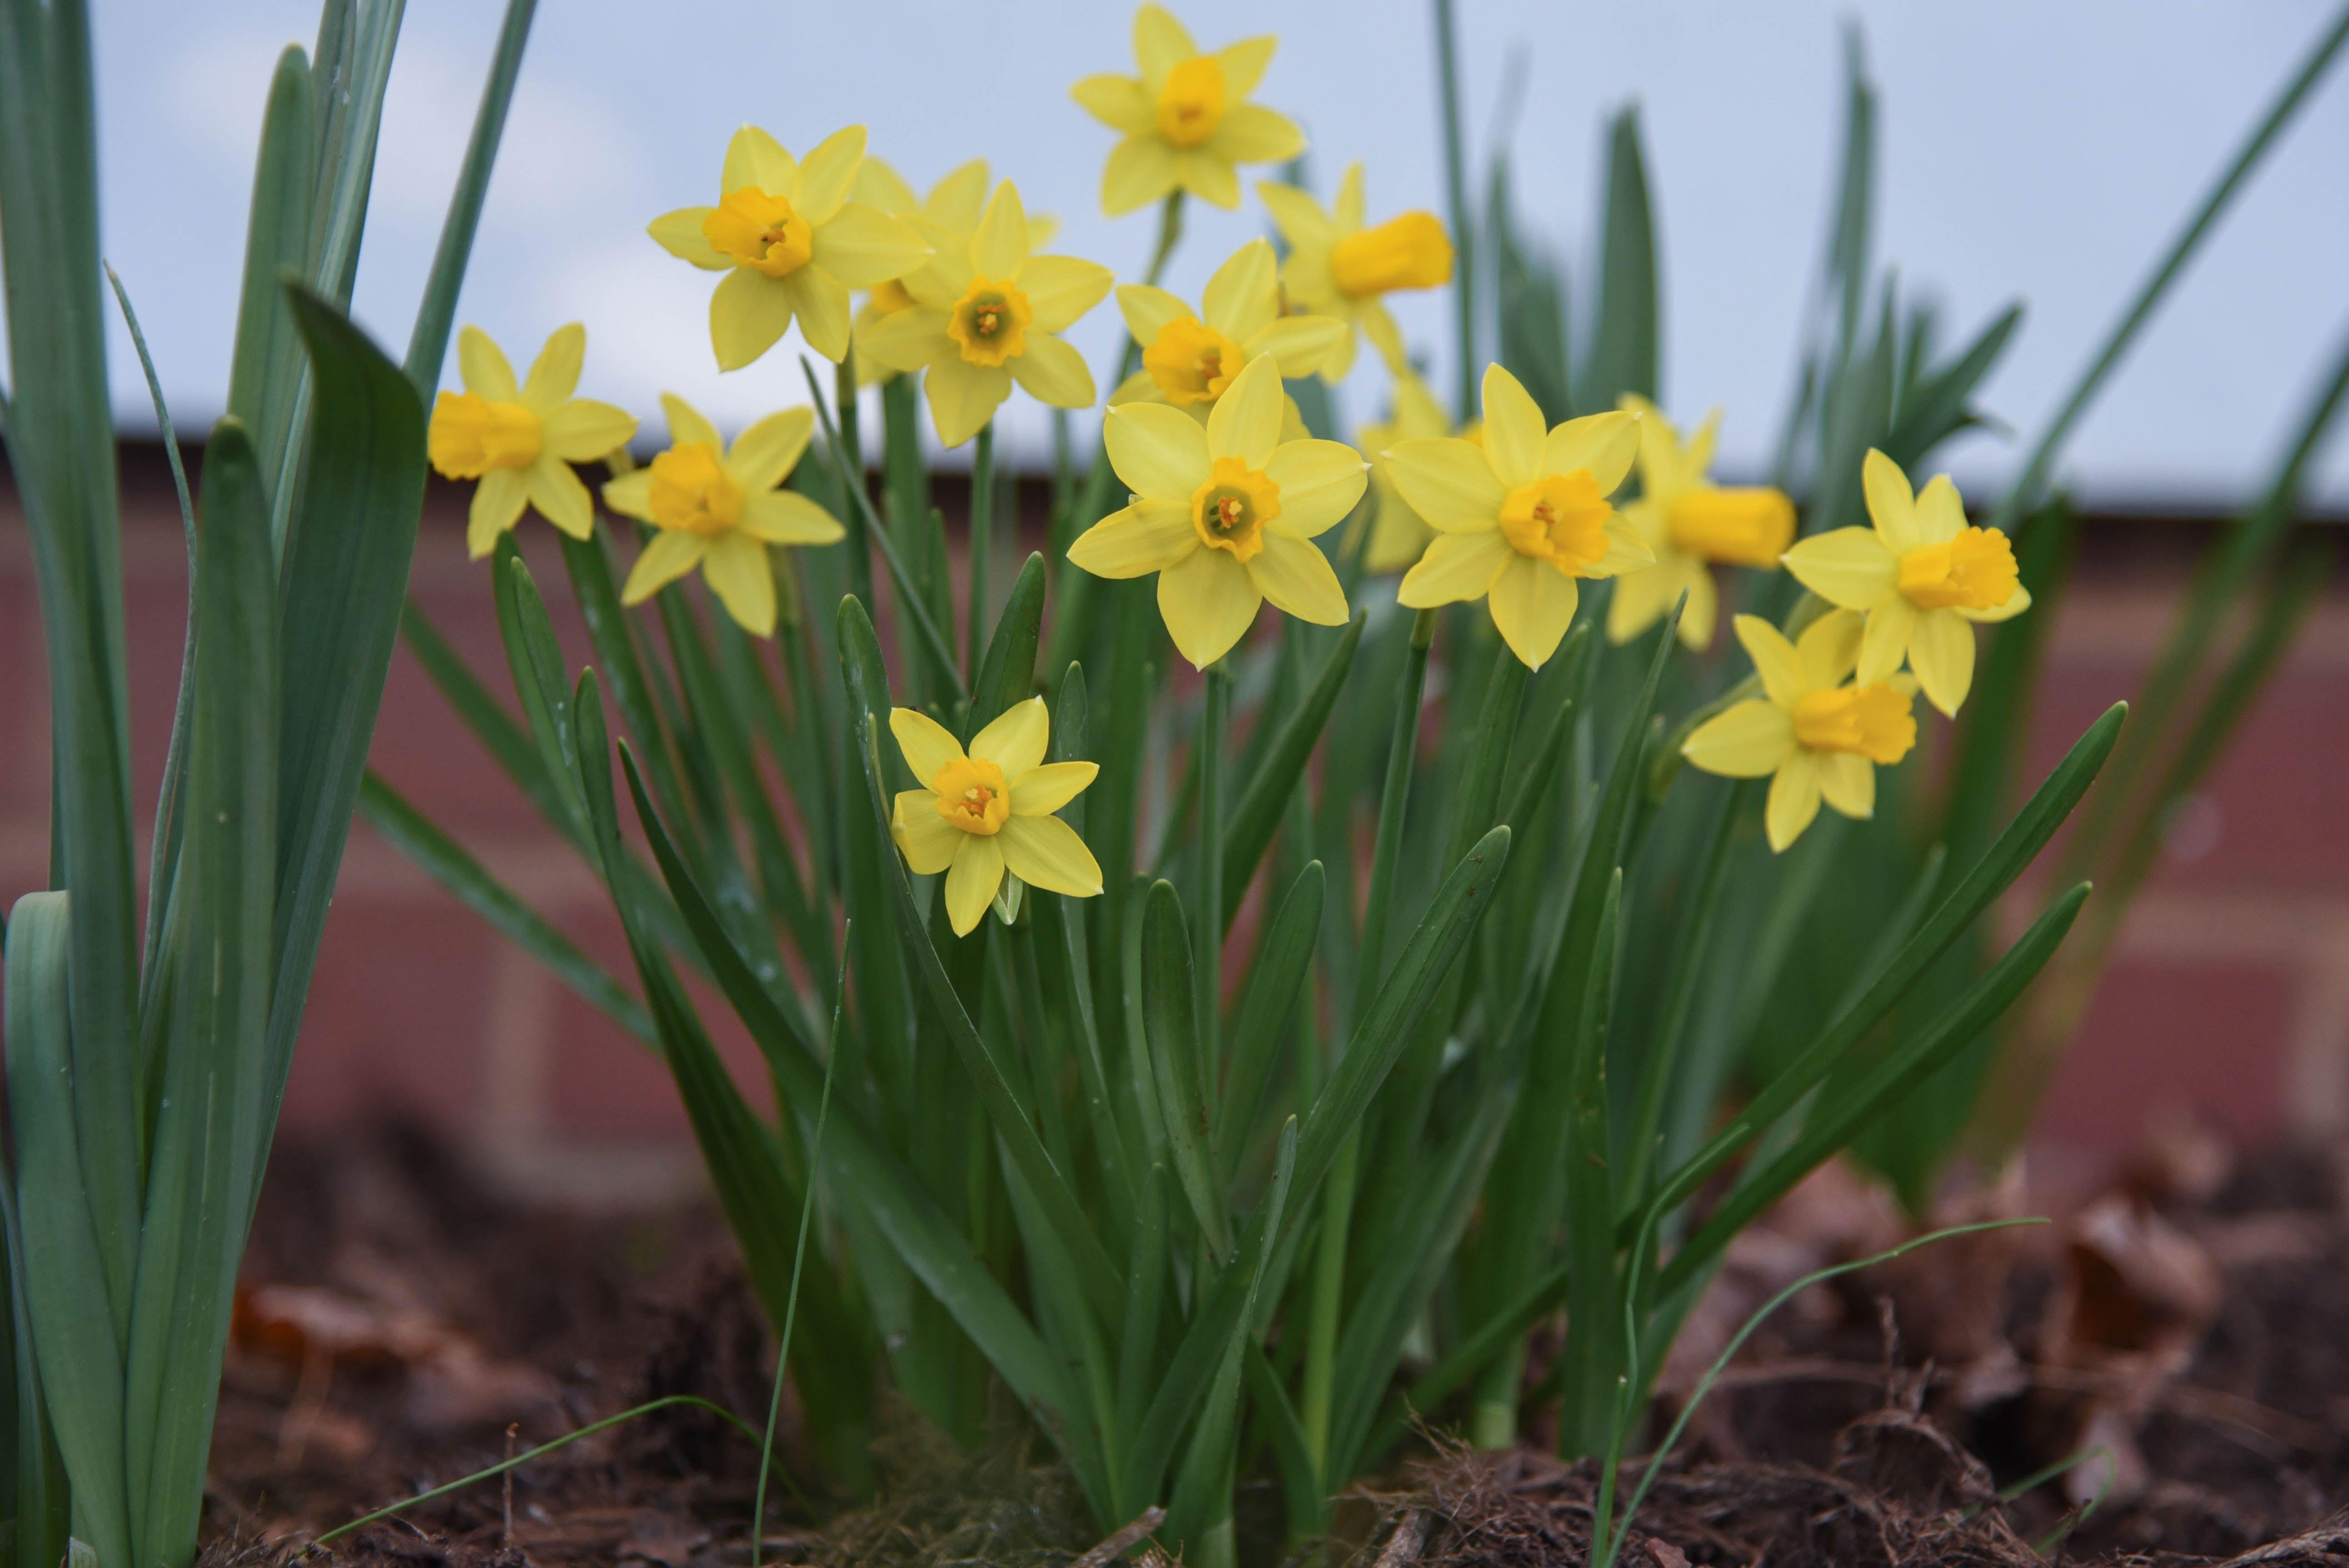 Daffodil Flowers Spring Garden Gardening Plants graphy Macro Bulbs